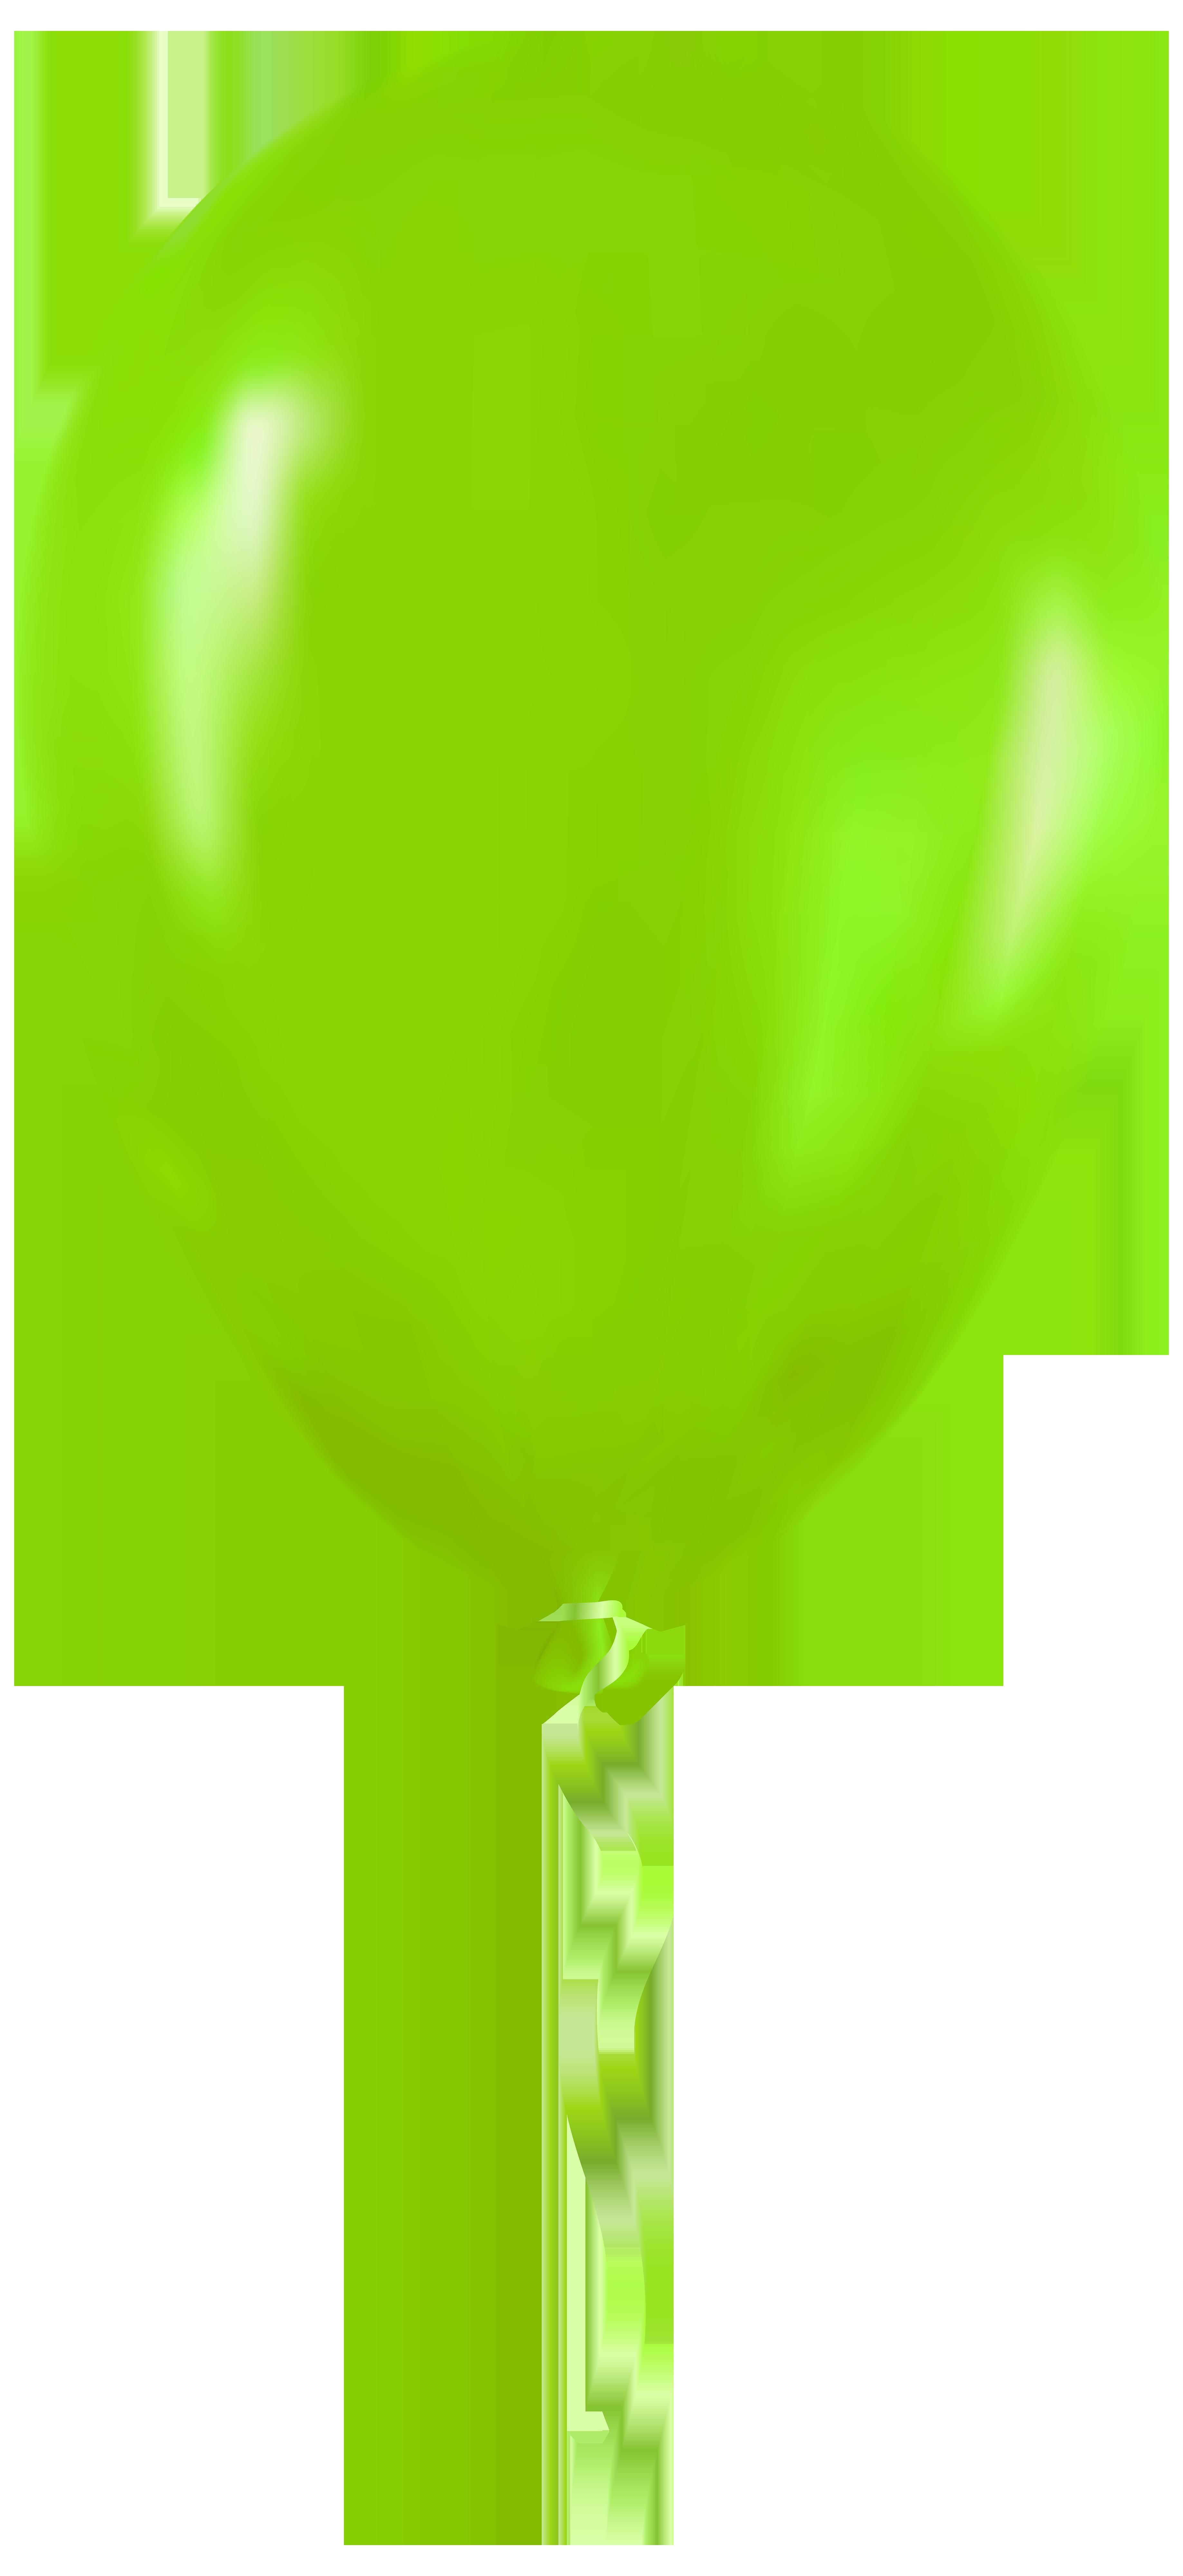 Balloon dog clipart image transparent stock Green Balloon PNG Clip Art - Best WEB Clipart image transparent stock